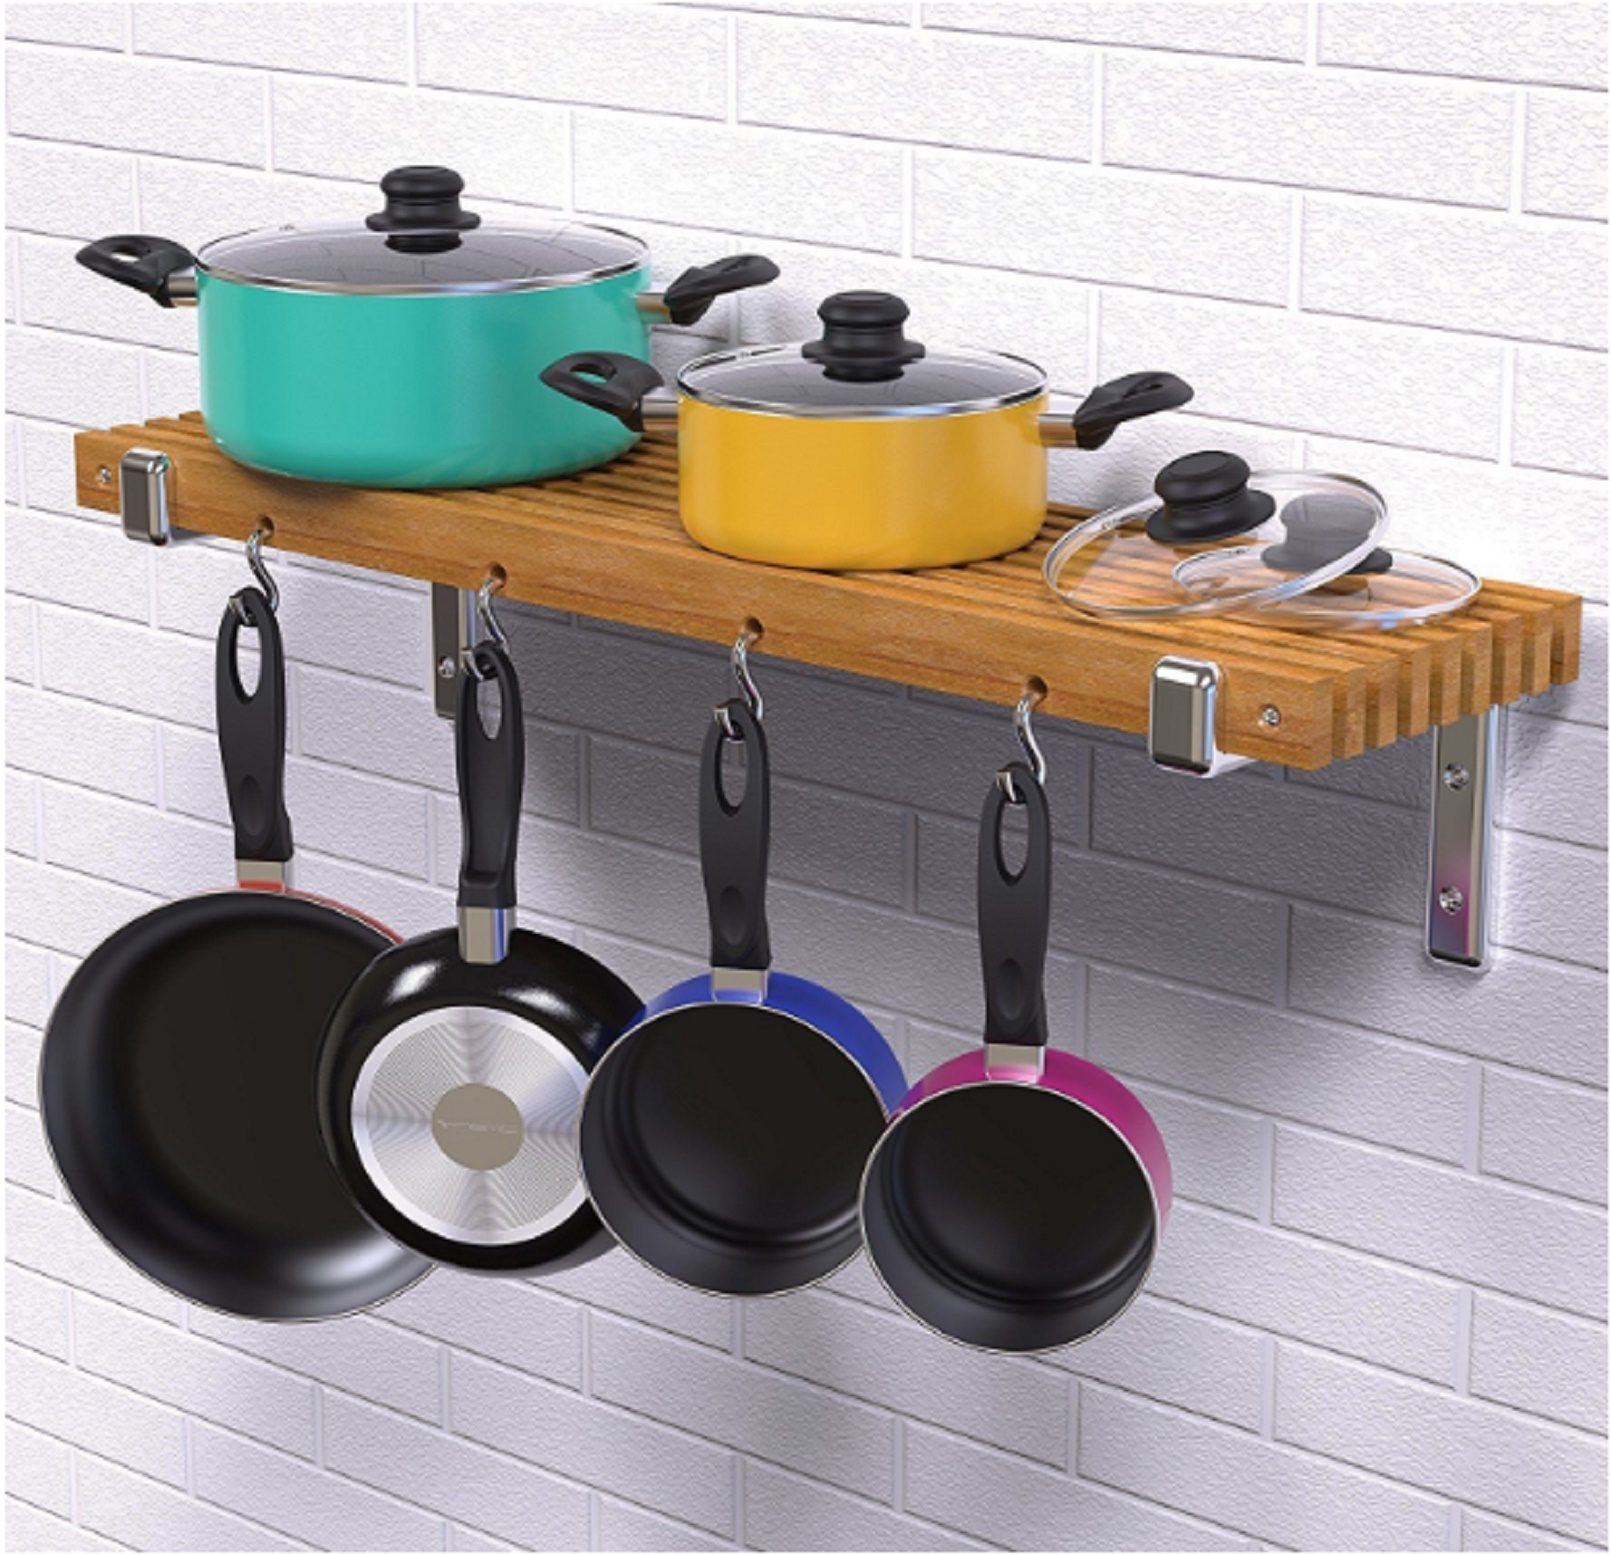 Tfal Pots And Pans Set